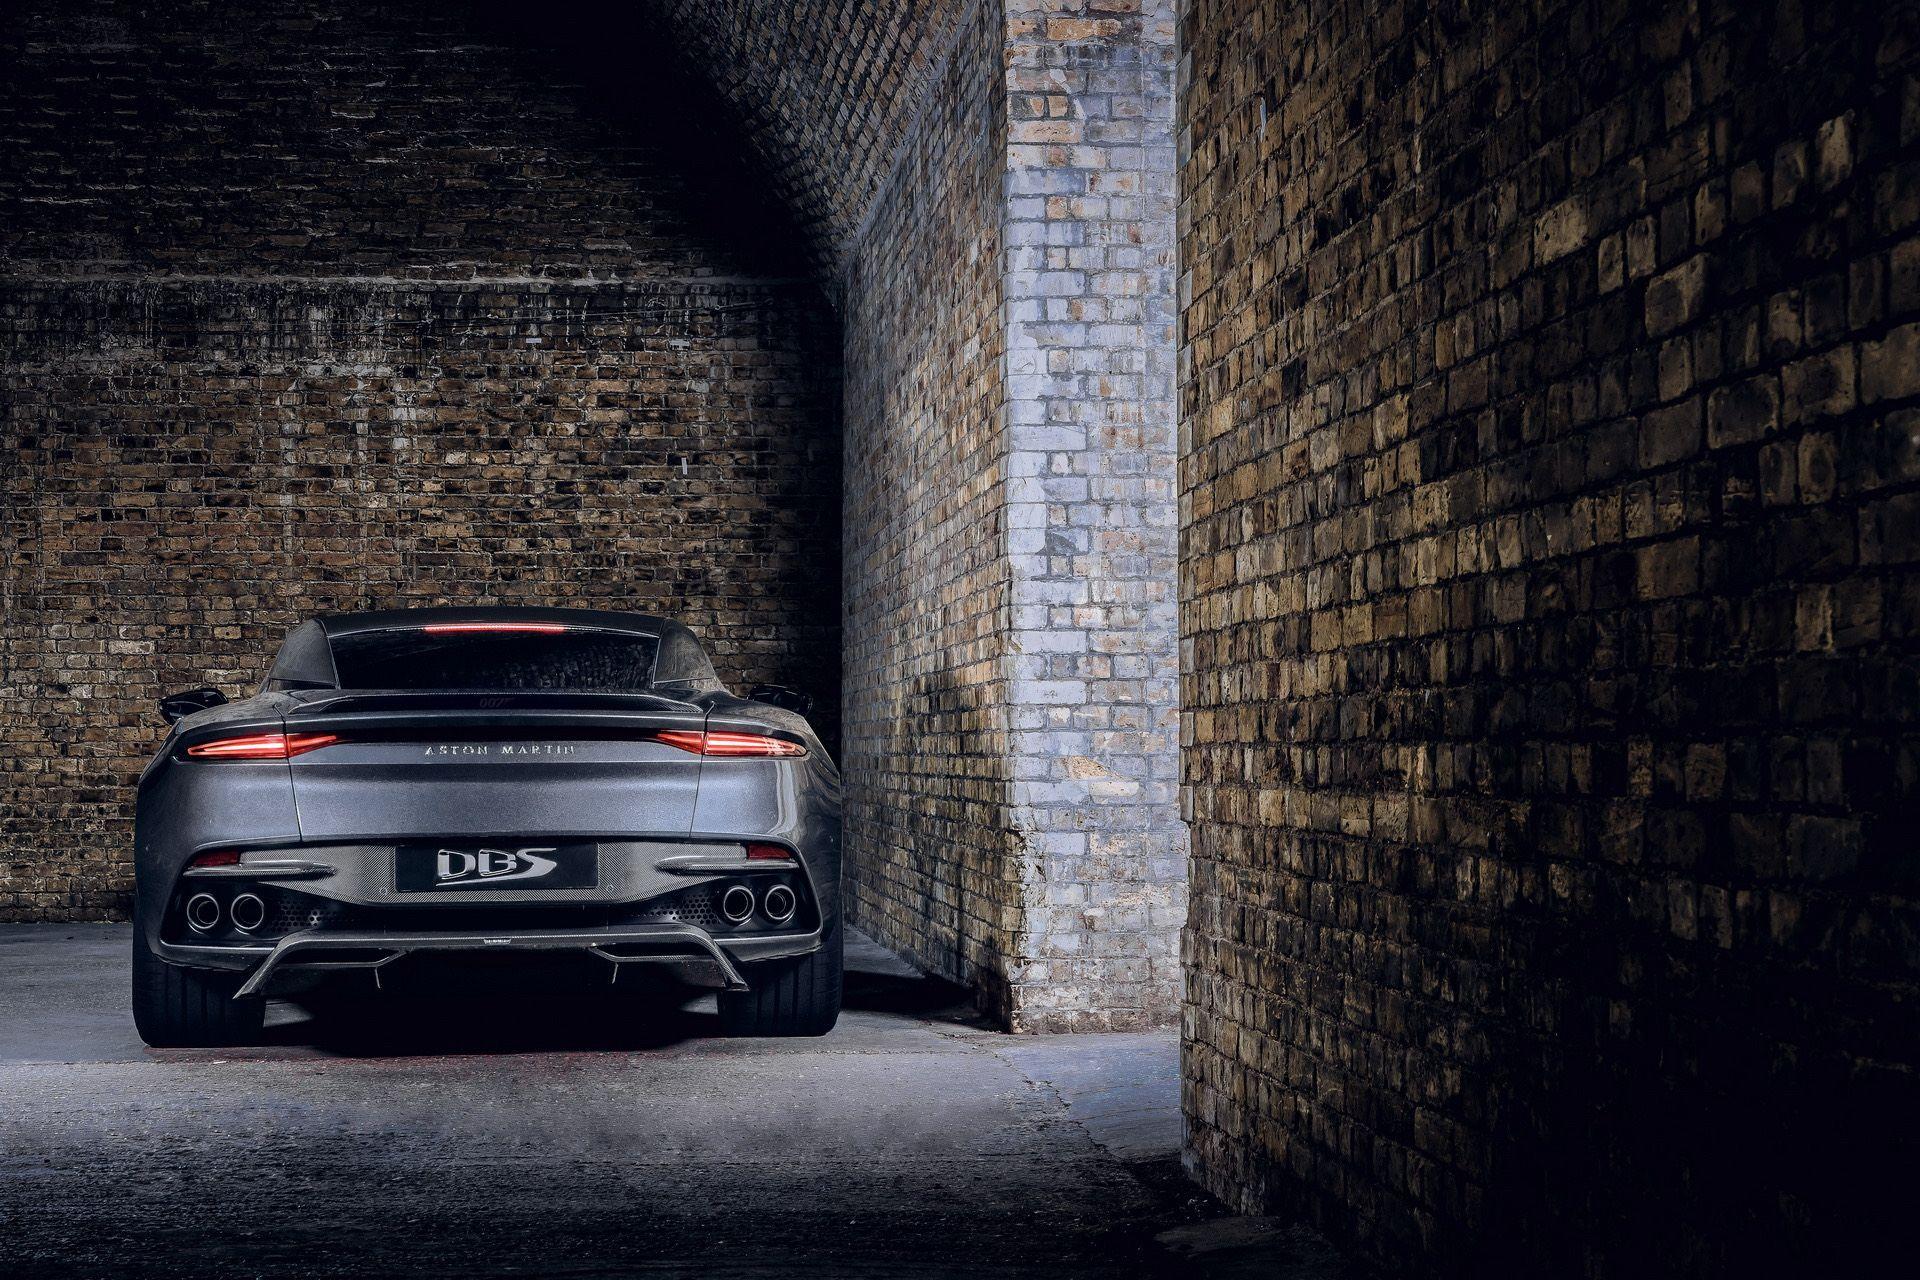 2021-aston-martin-dbs-superleggera-007-edition-5